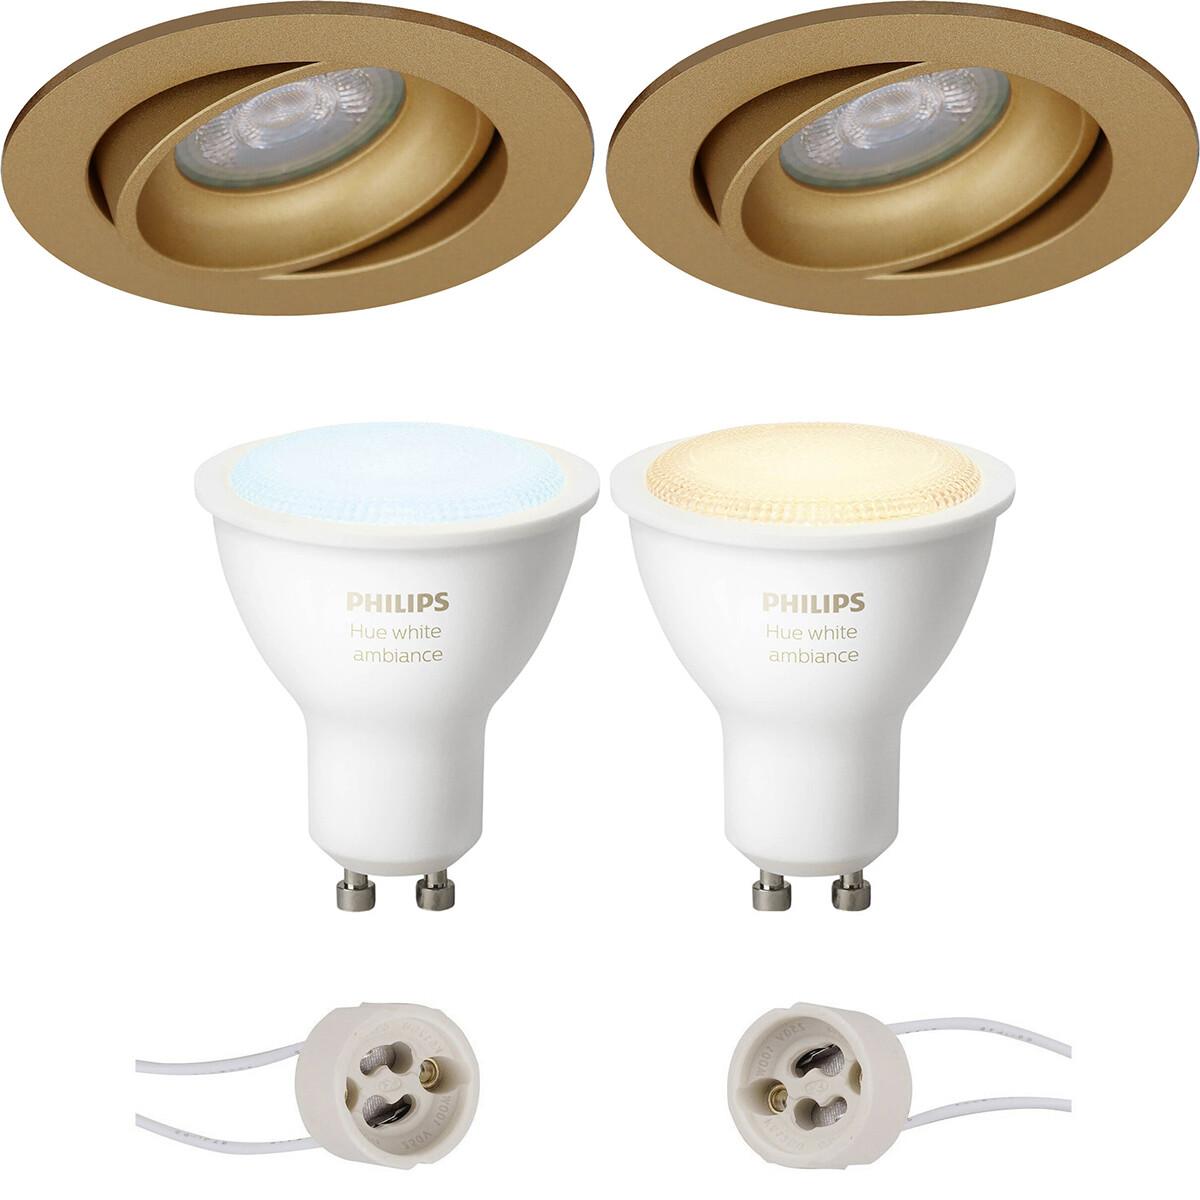 Pragmi Delton Pro - Inbouw Rond - Mat Goud - Kantelbaar - Ø82mm - Philips Hue - LED Spot Set GU10 -